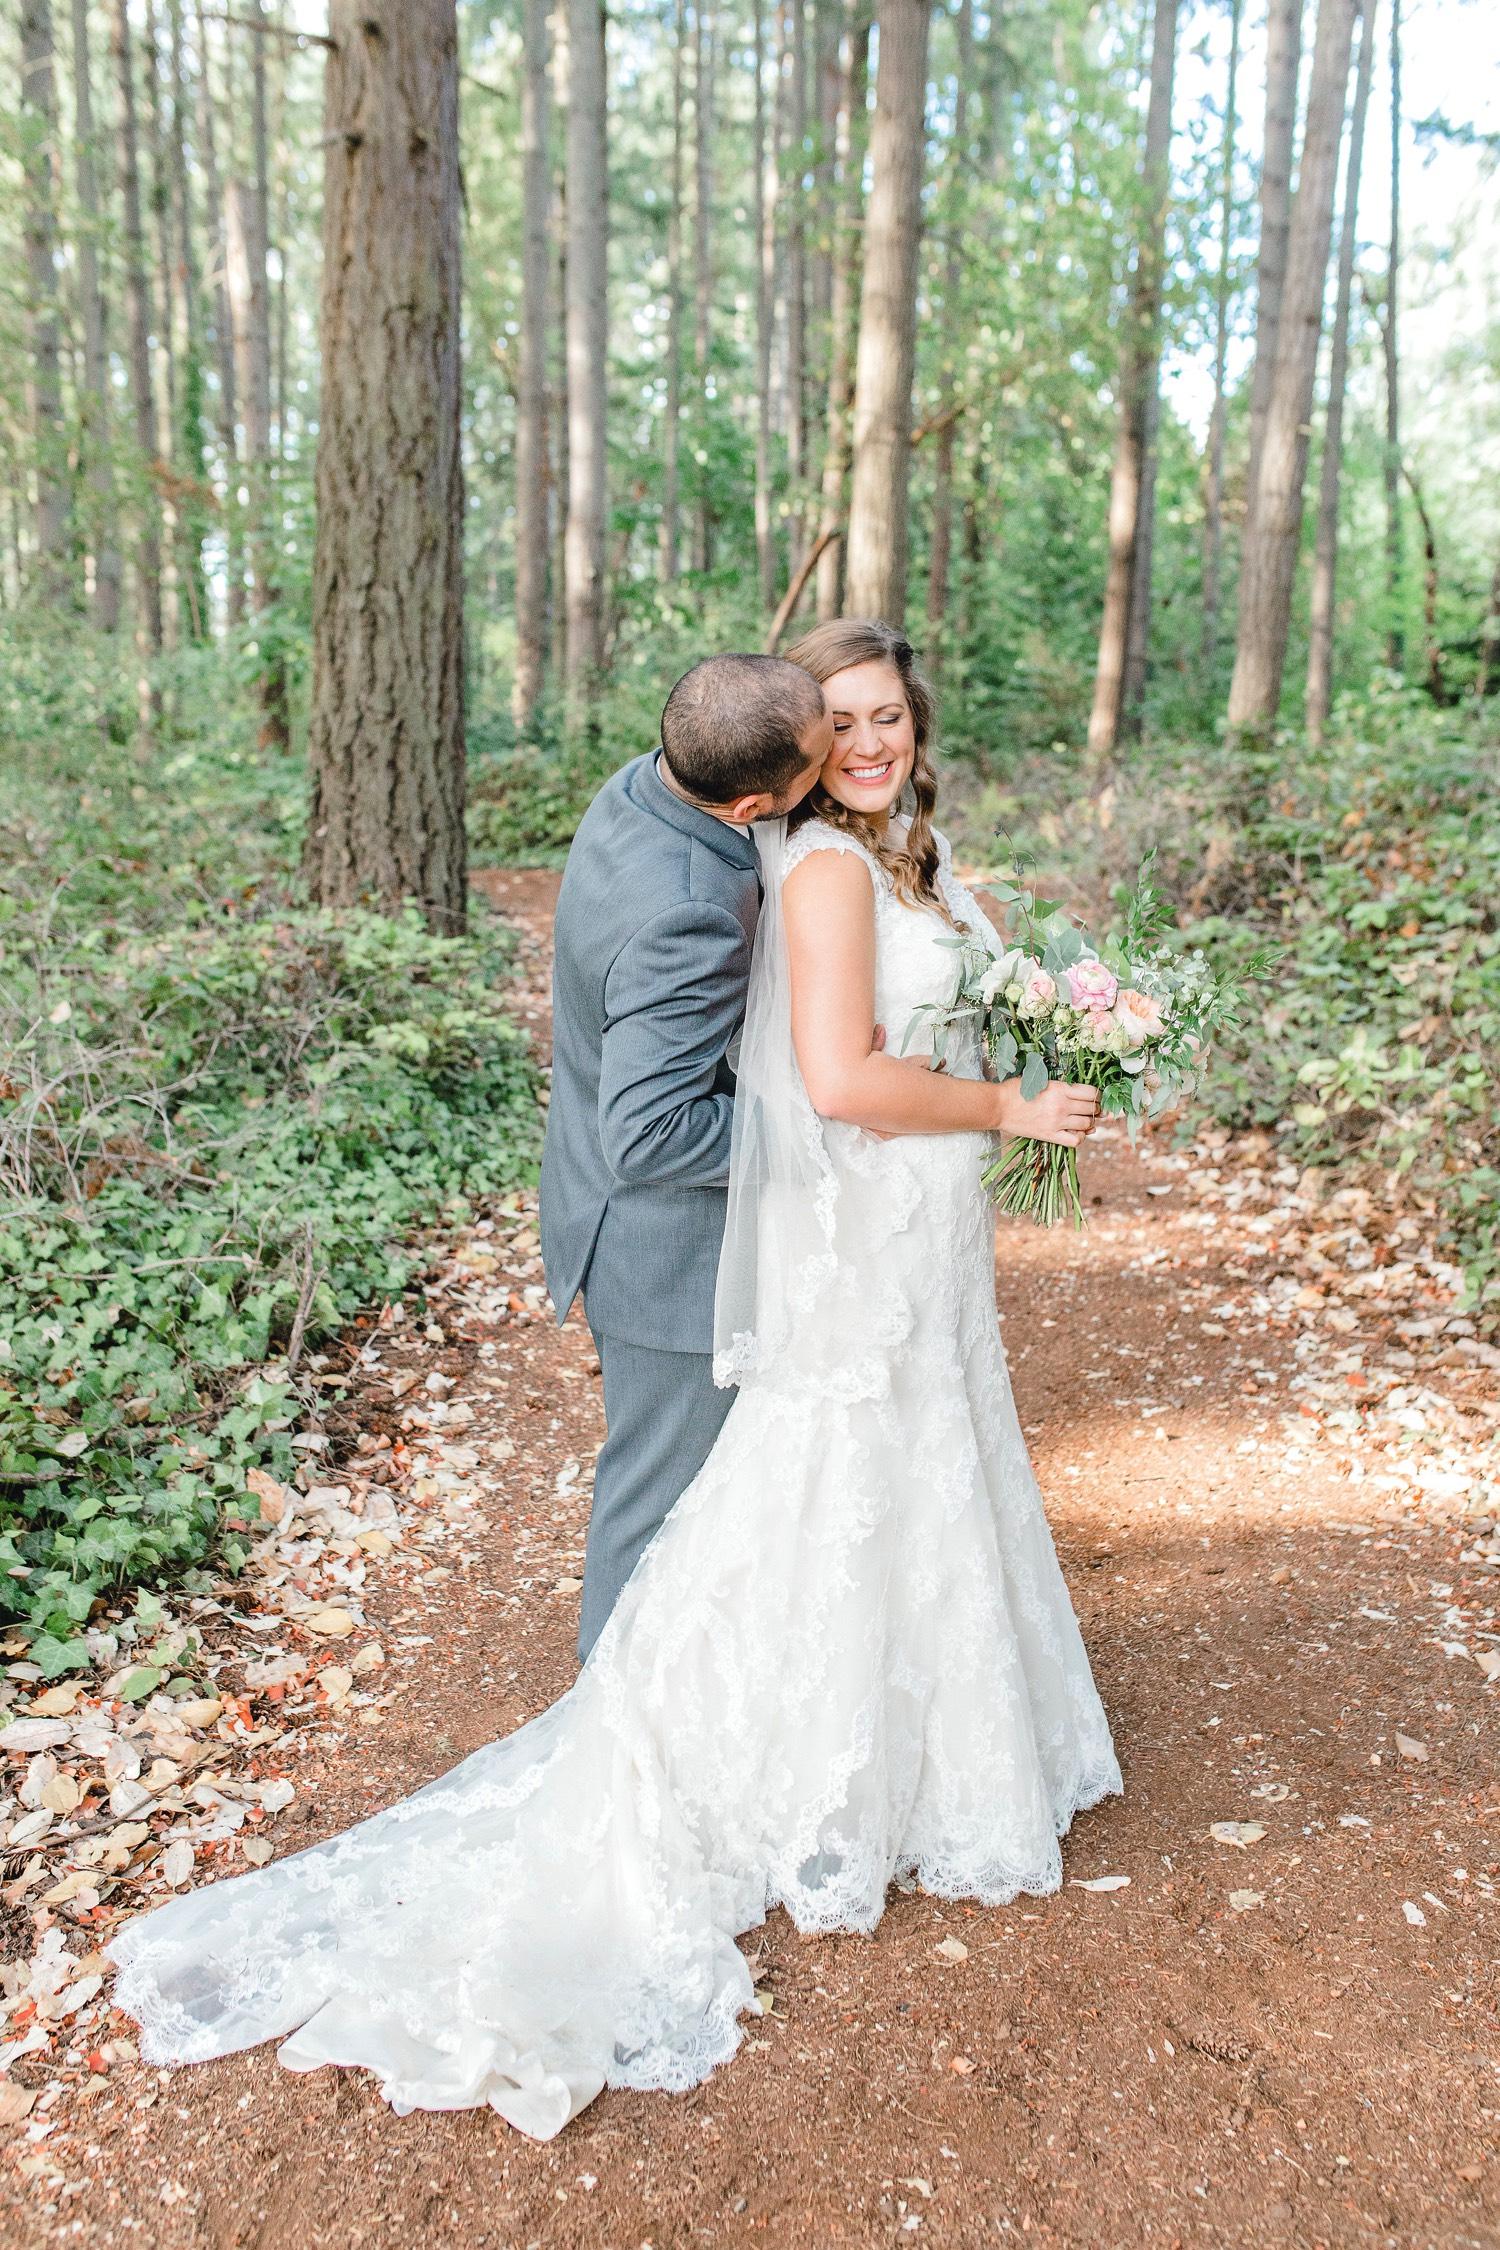 0000000000071_emmarosecompany_katiematt-3737_Photographer_PNW_House_Robinswood_Emma_Light_Company_Airy_Rose_and_Wedding_Seattle.jpg